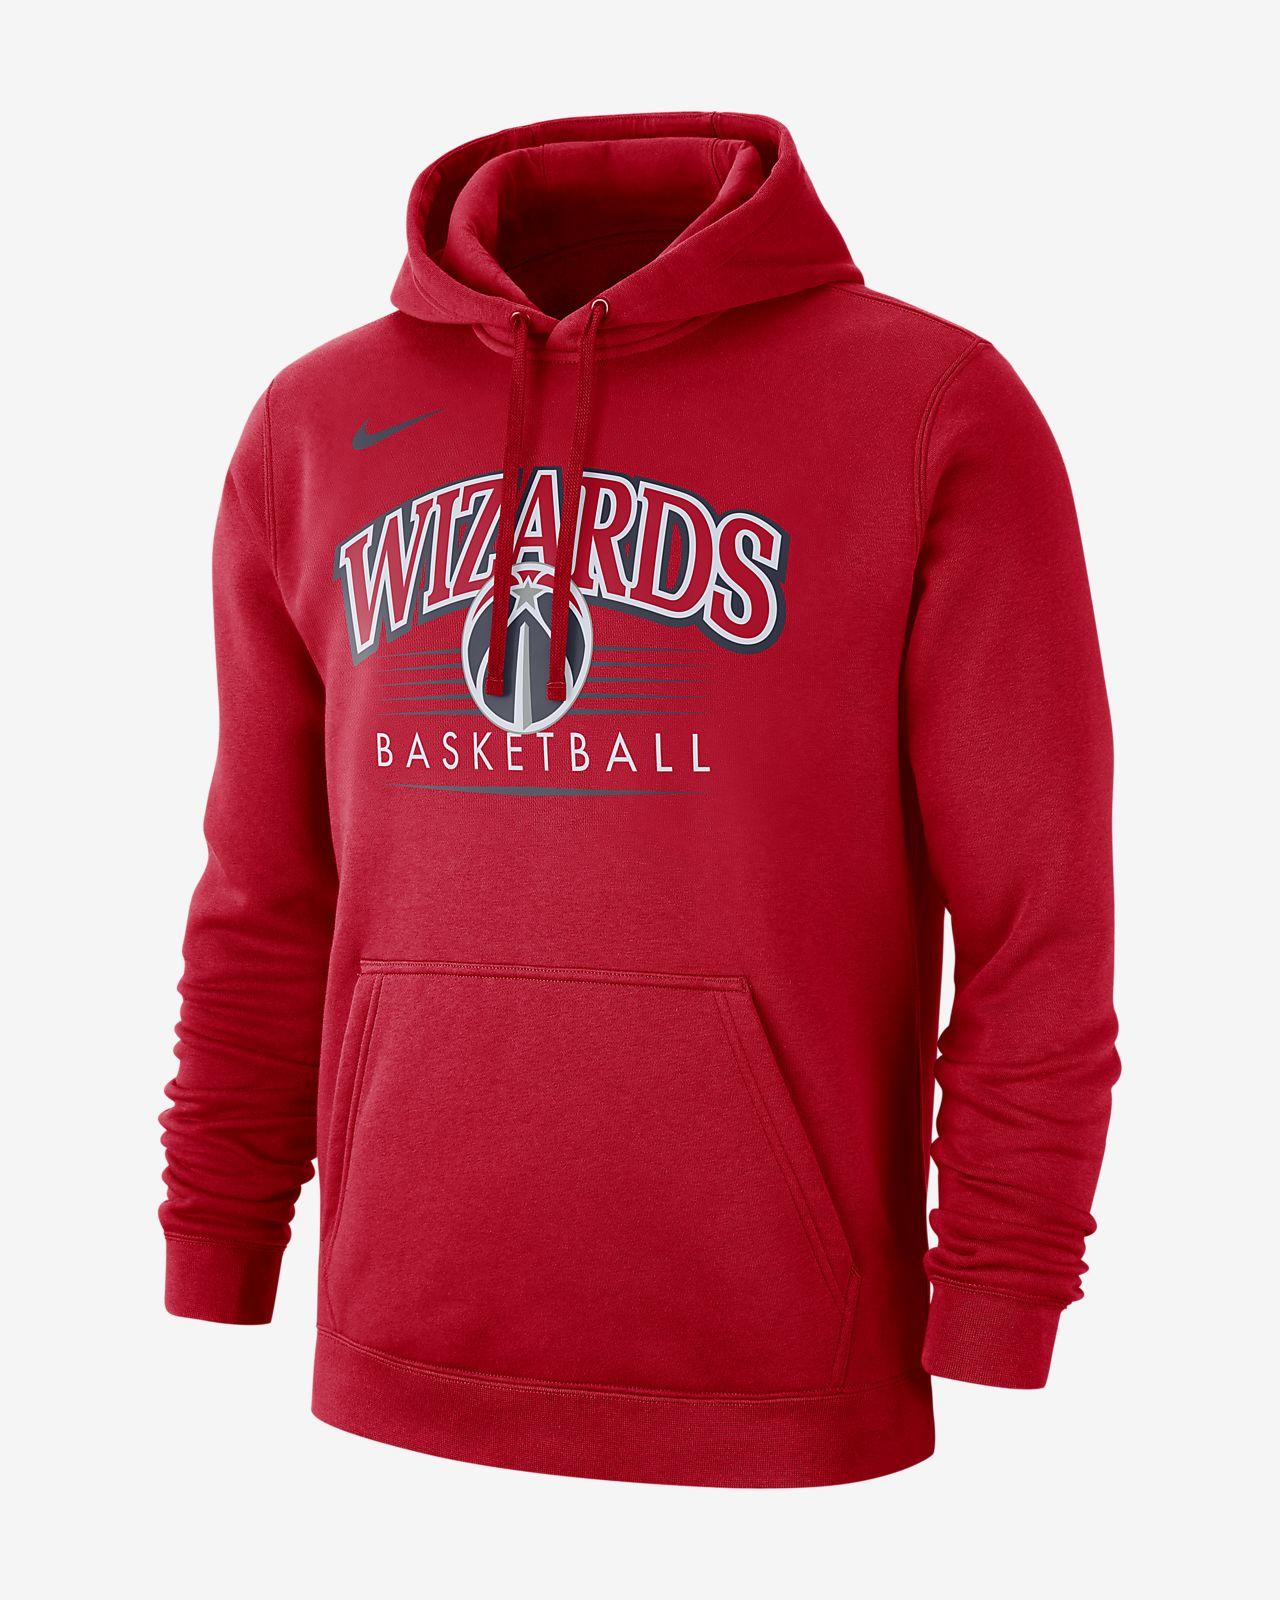 Washington Wizards Nike Men's NBA Hoodie